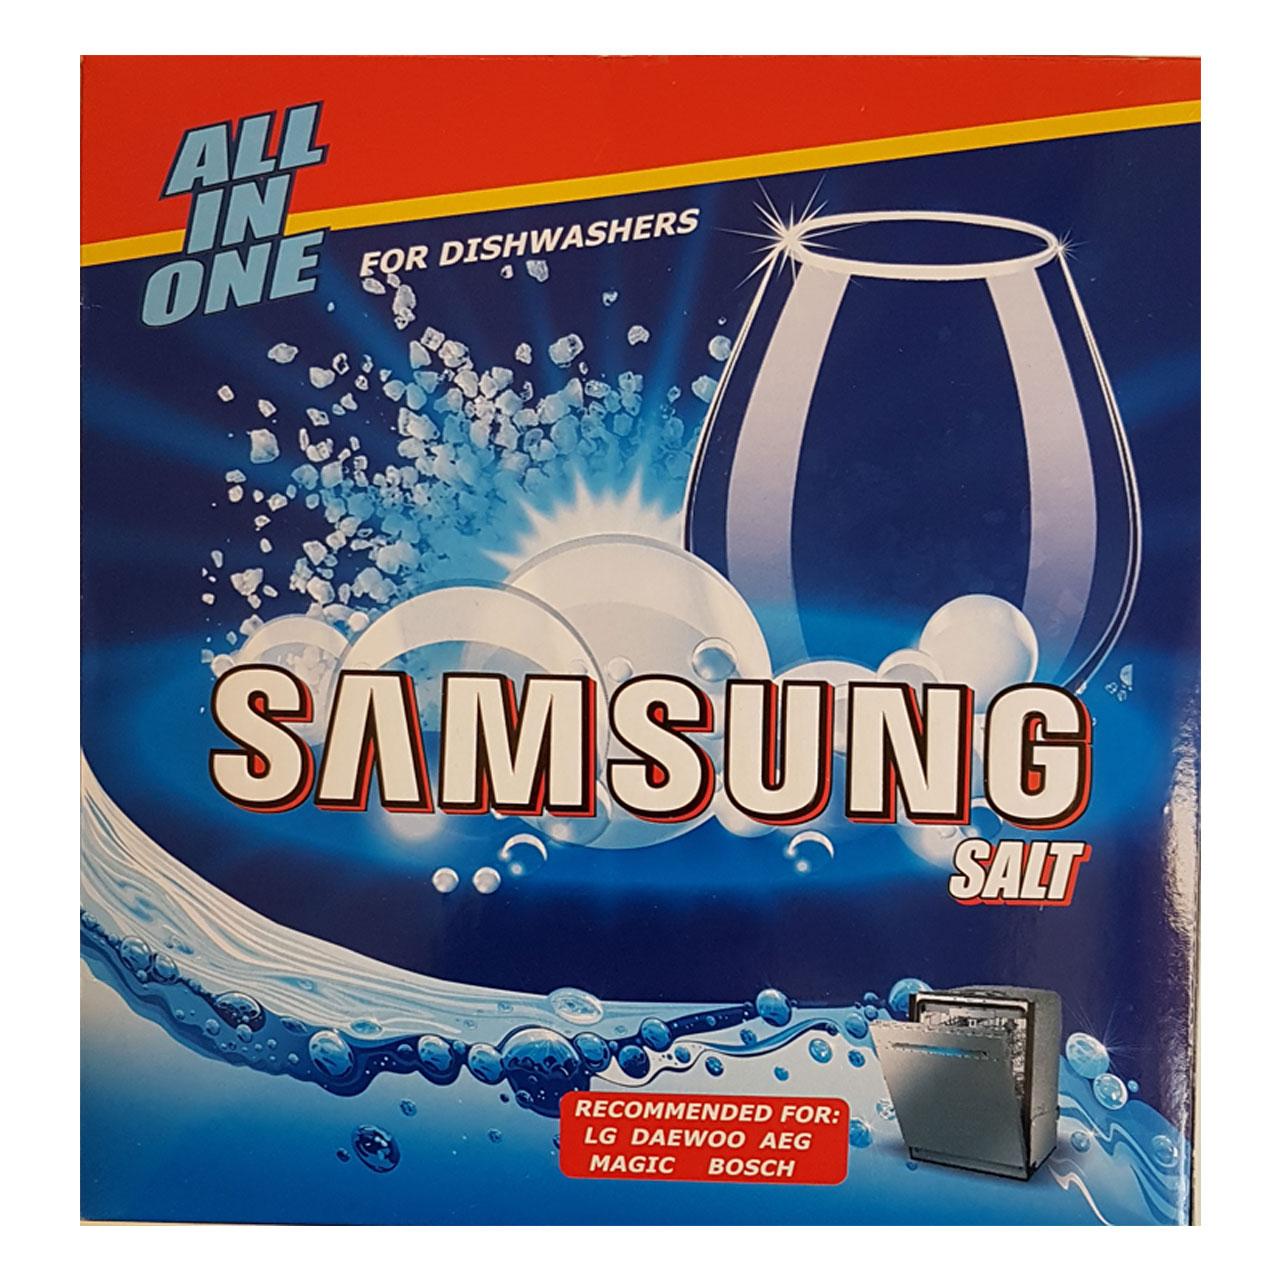 خرید                     نمک ظرفشویی سامسونگ بسته 2 کیلویی مدل All in one